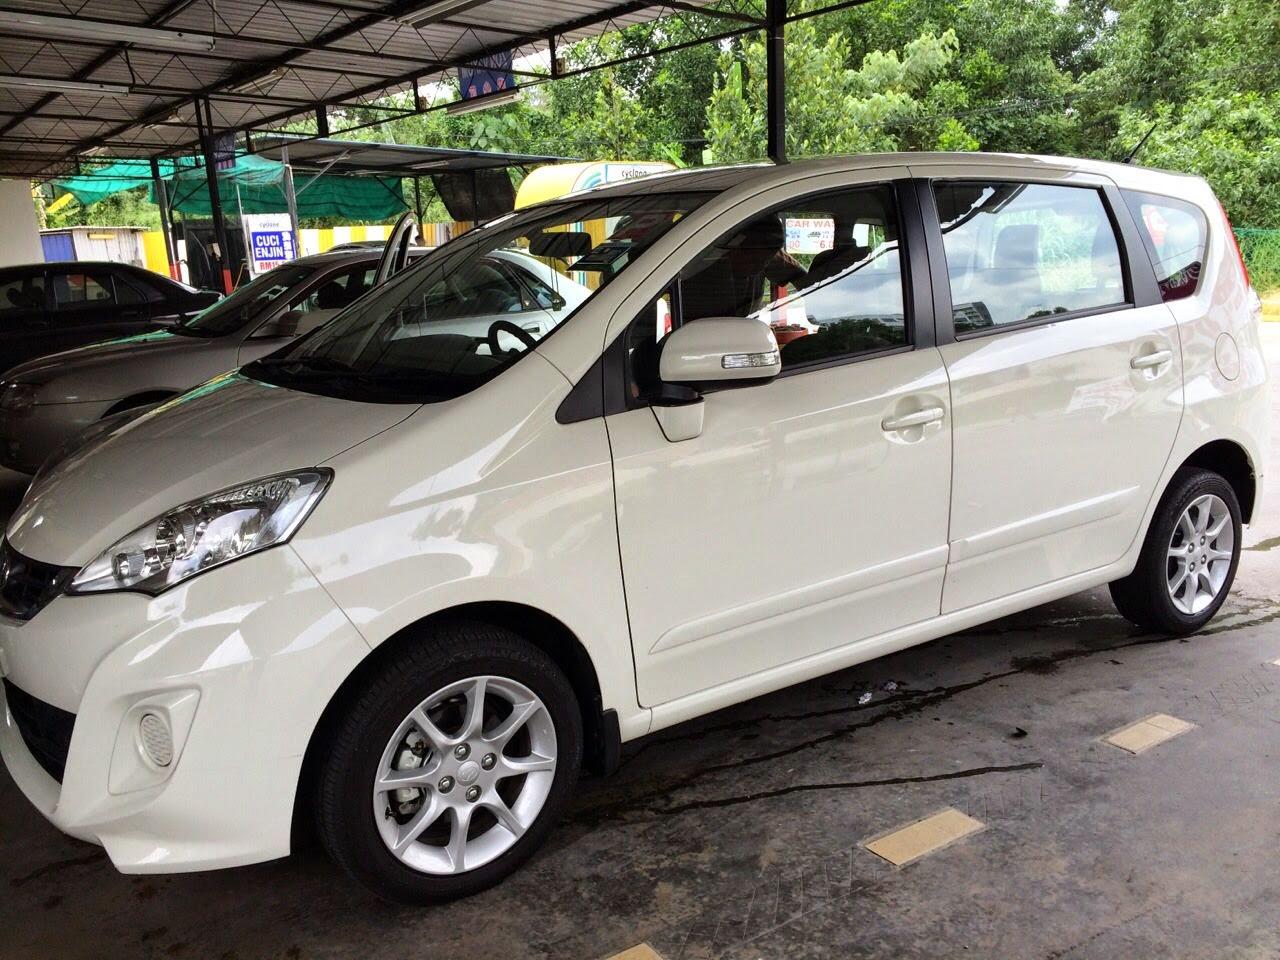 KERETA SEWA GELANG PATAH.  Klezcar Malaysia Car Rental